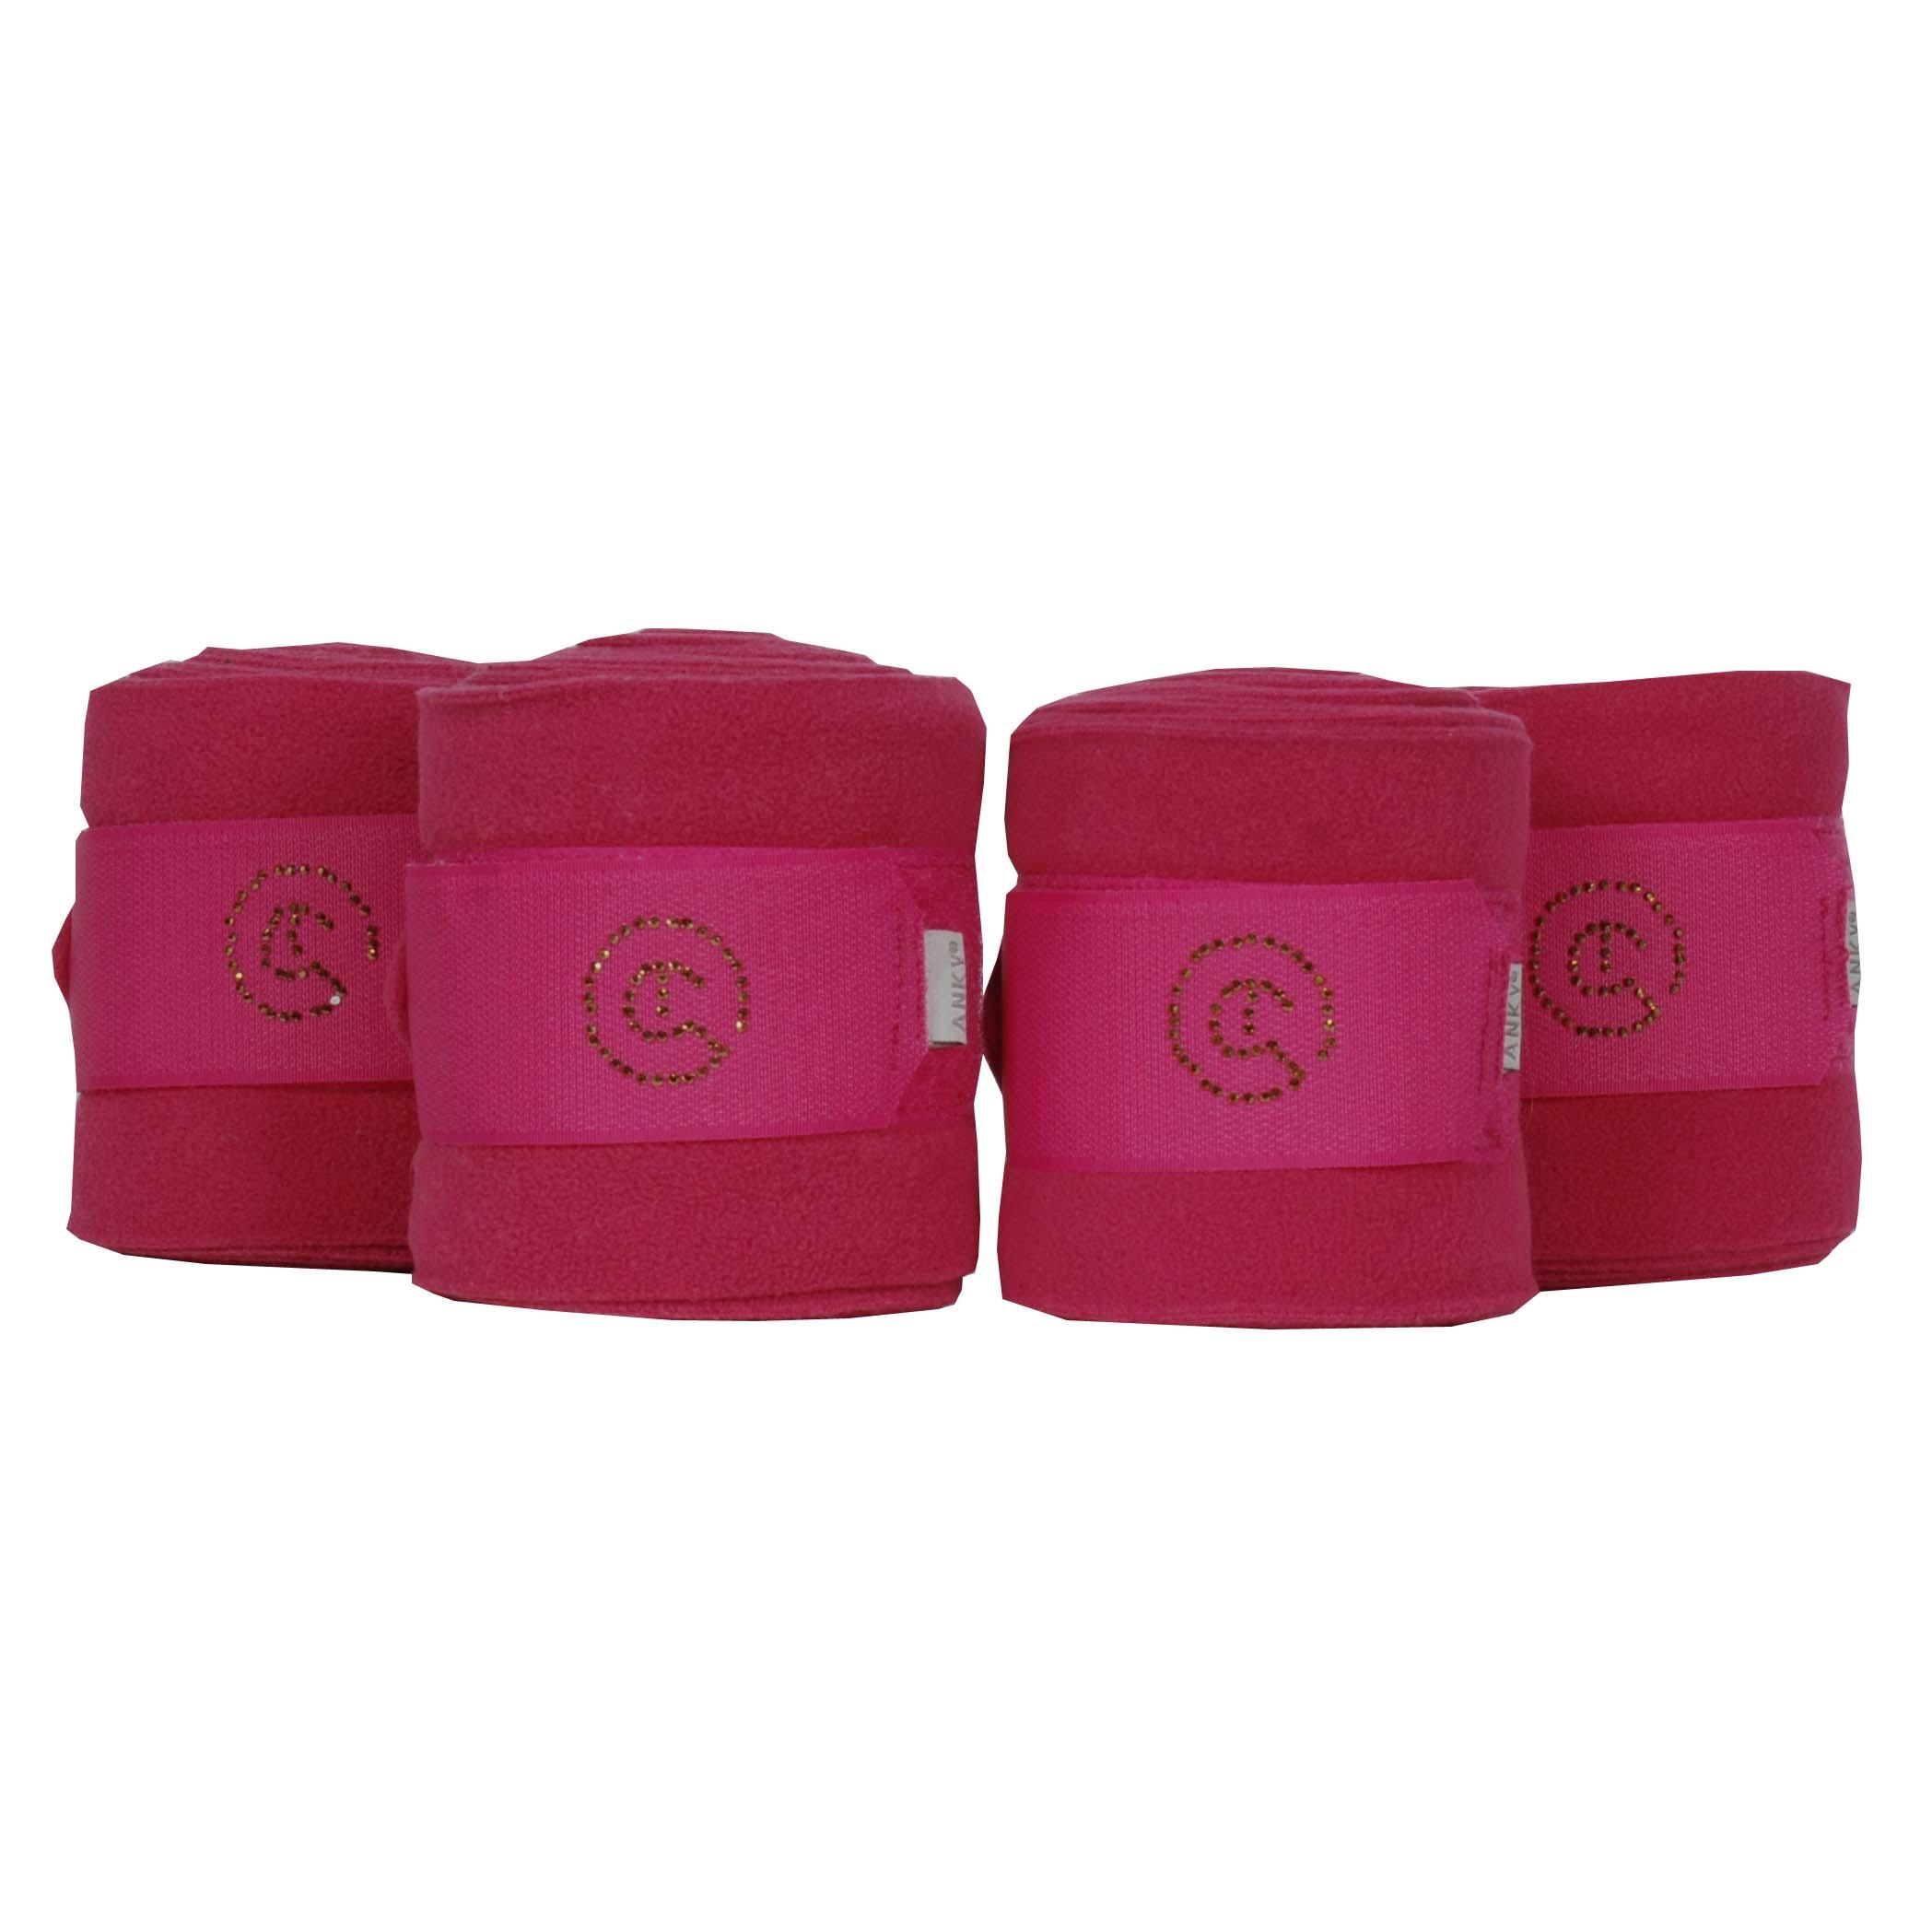 ANKY ATB22001 bandages fuchsia maat:one size